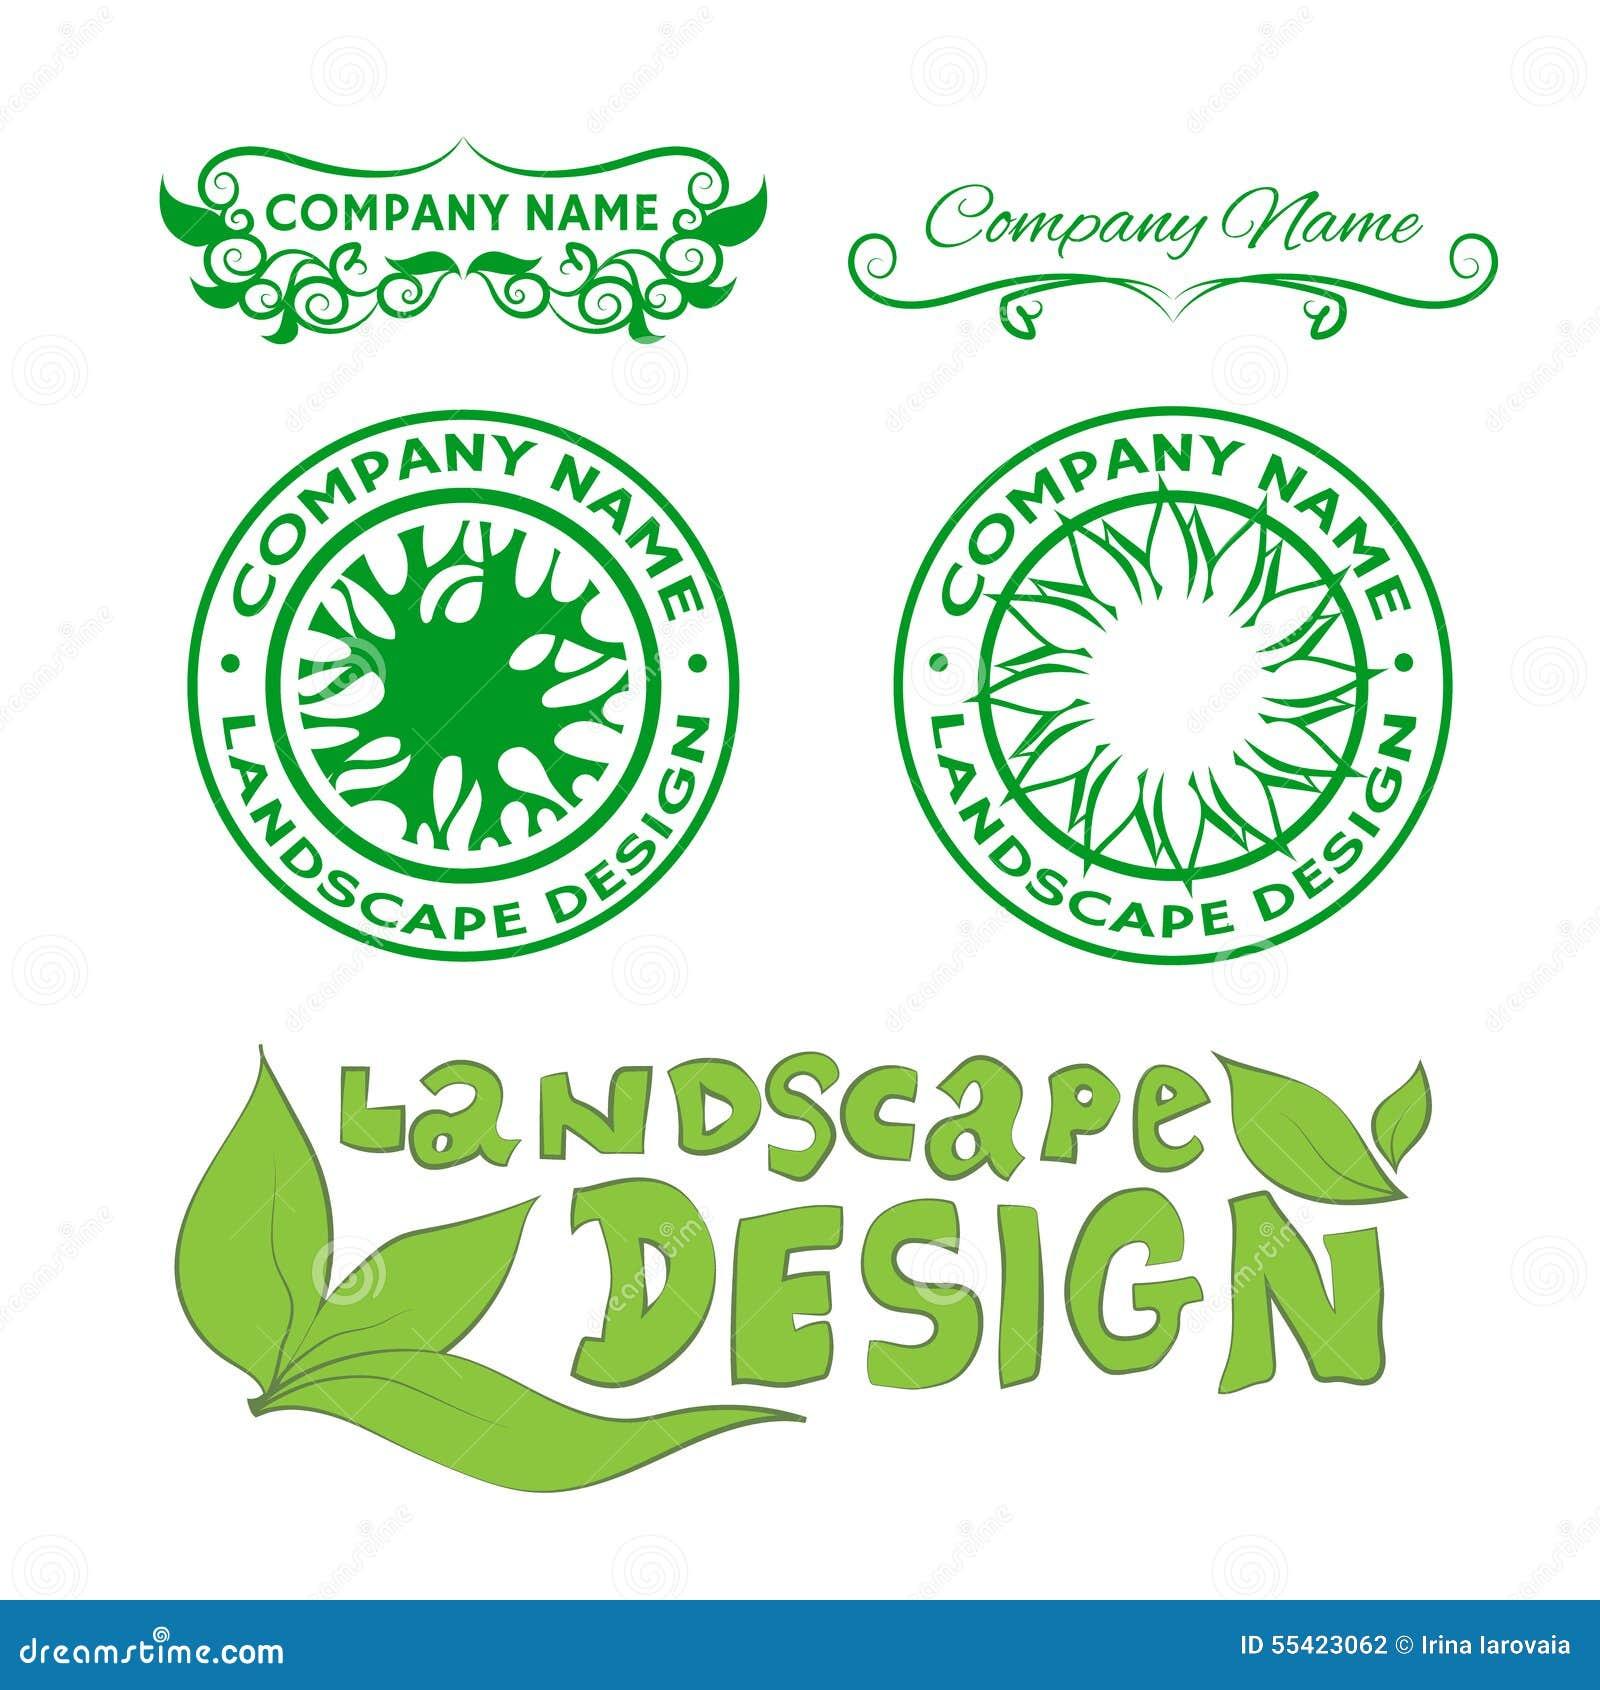 Landscape design logos stock vector. Illustration of over ...